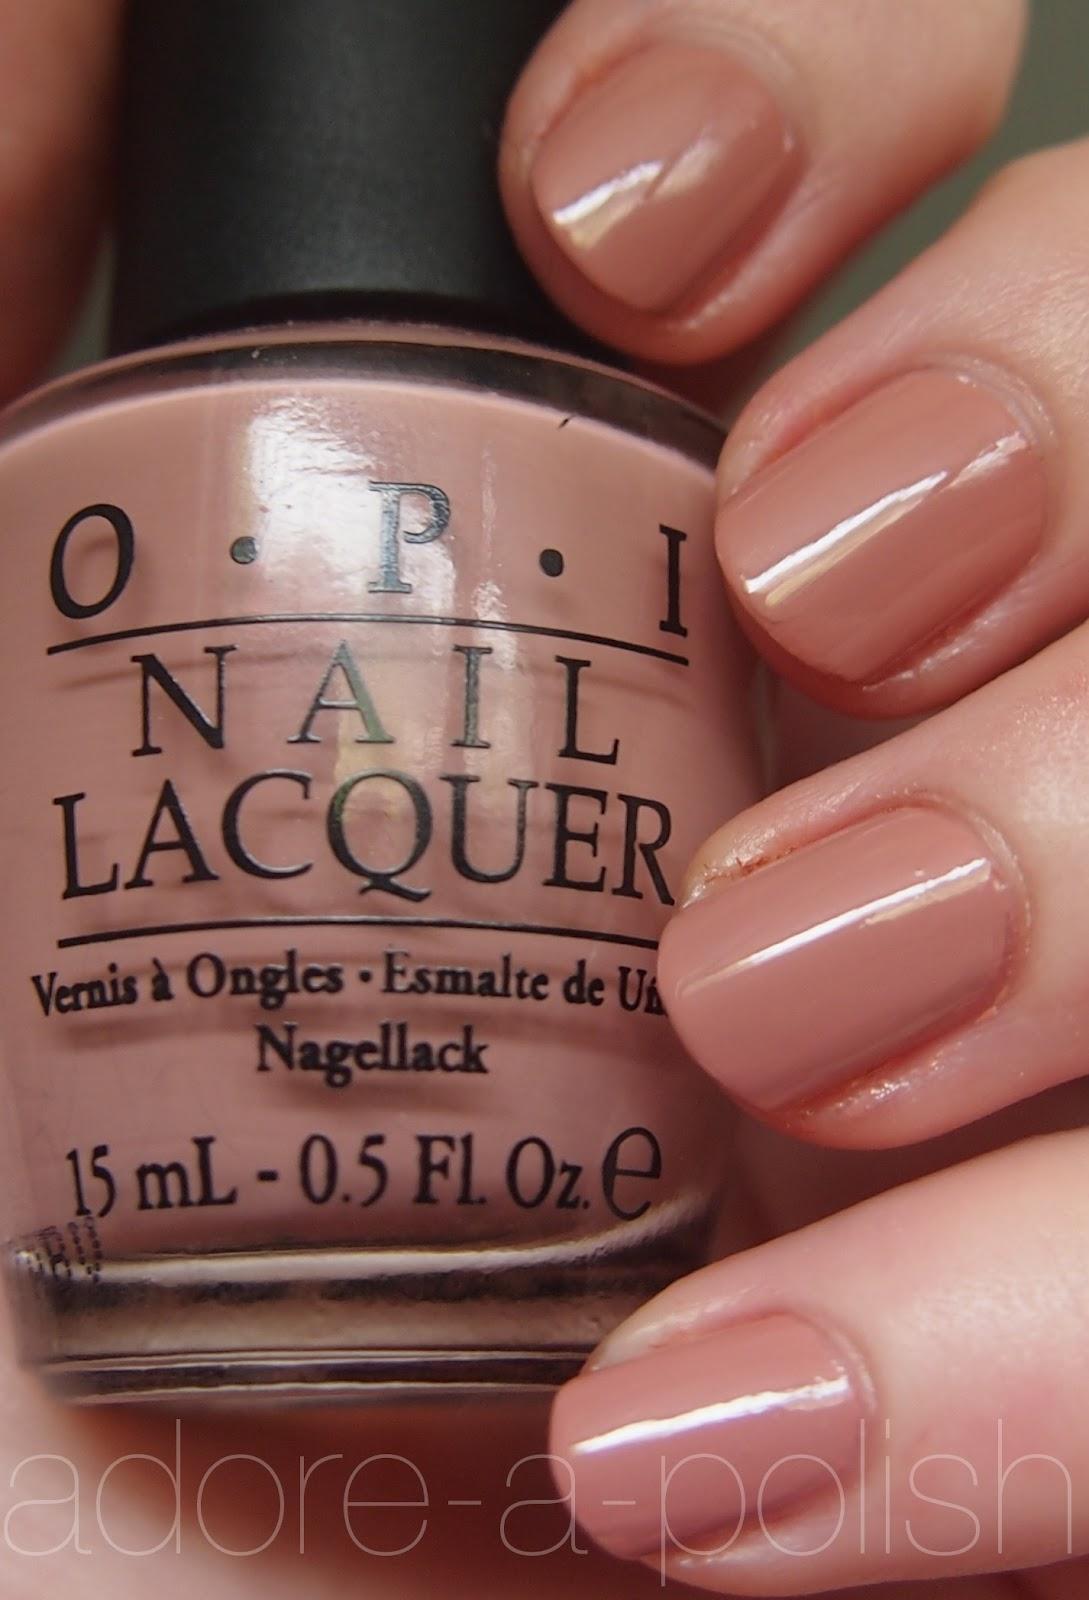 Opi Dulce De Leche Adore A Polish A Simple Beauty Blog